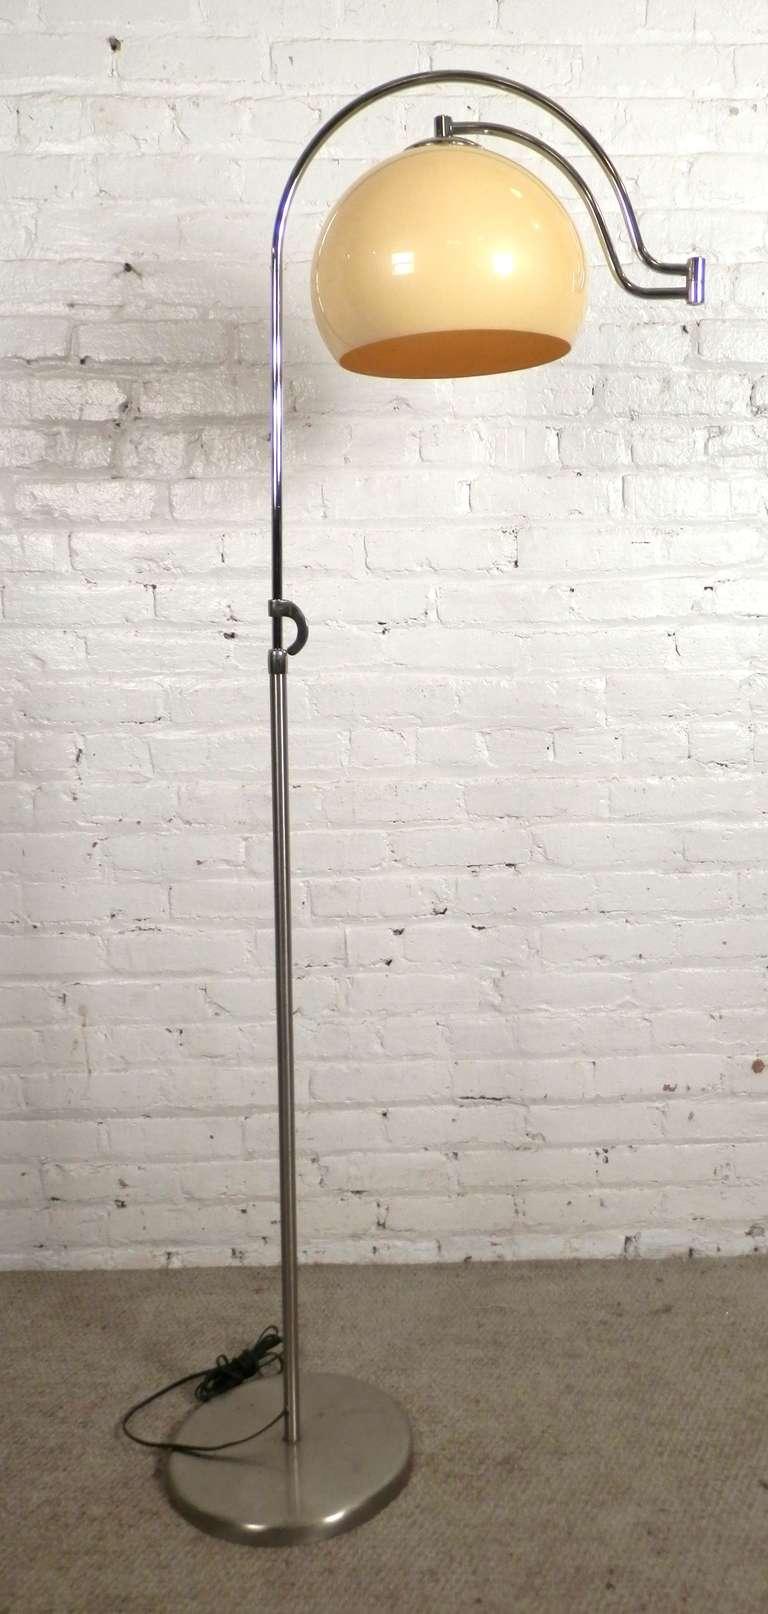 Unusual Adjustable Floor Lamp W Swing Arm For Sale At 1stdibs